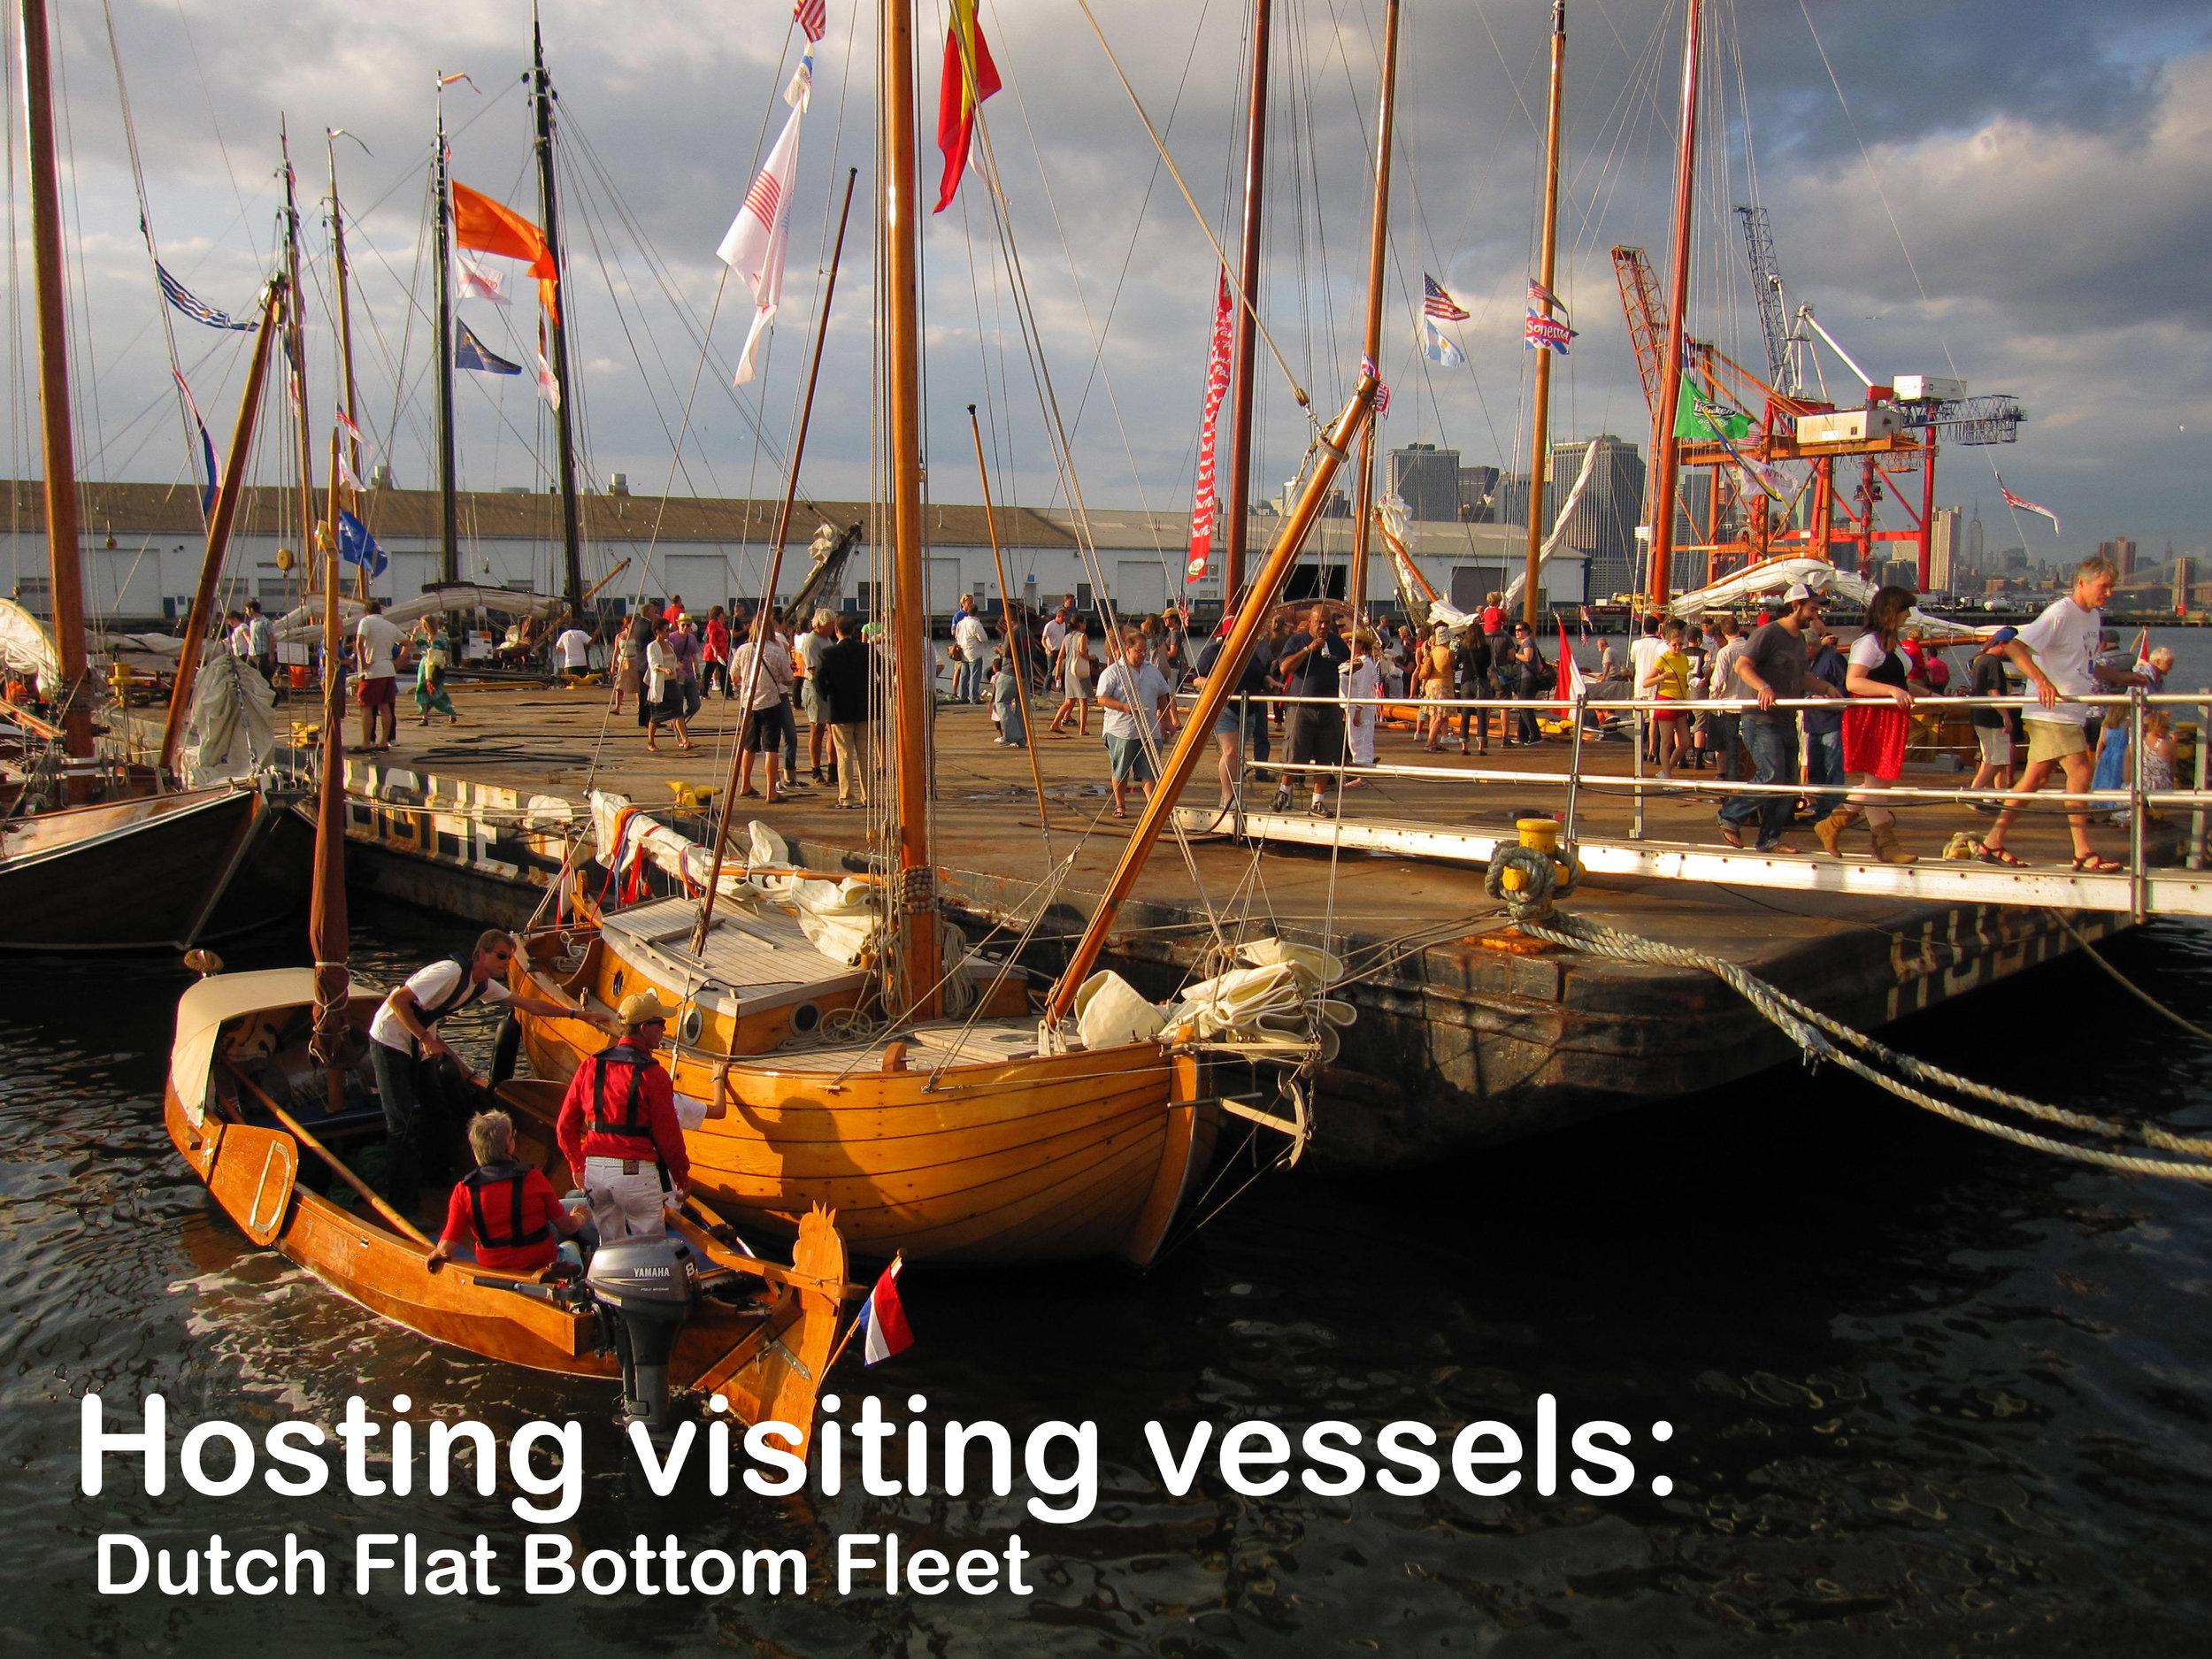 dutch flat bottoms-bringing-historic-ships.jpg